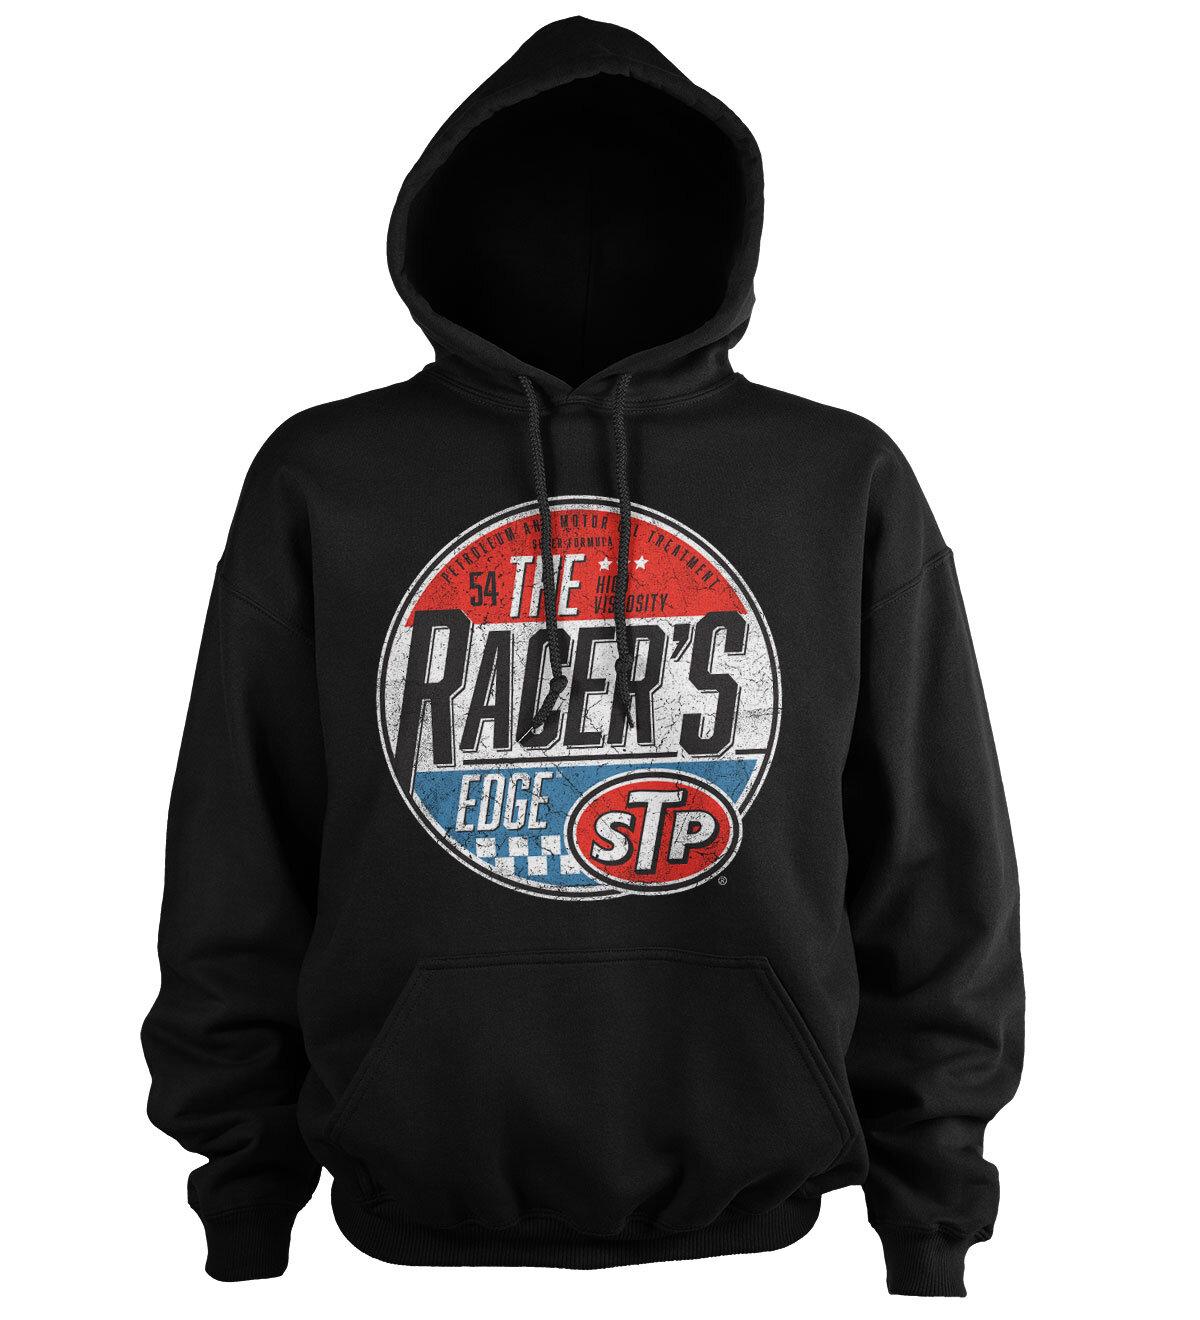 STP - The Racer's Edge Hoodie